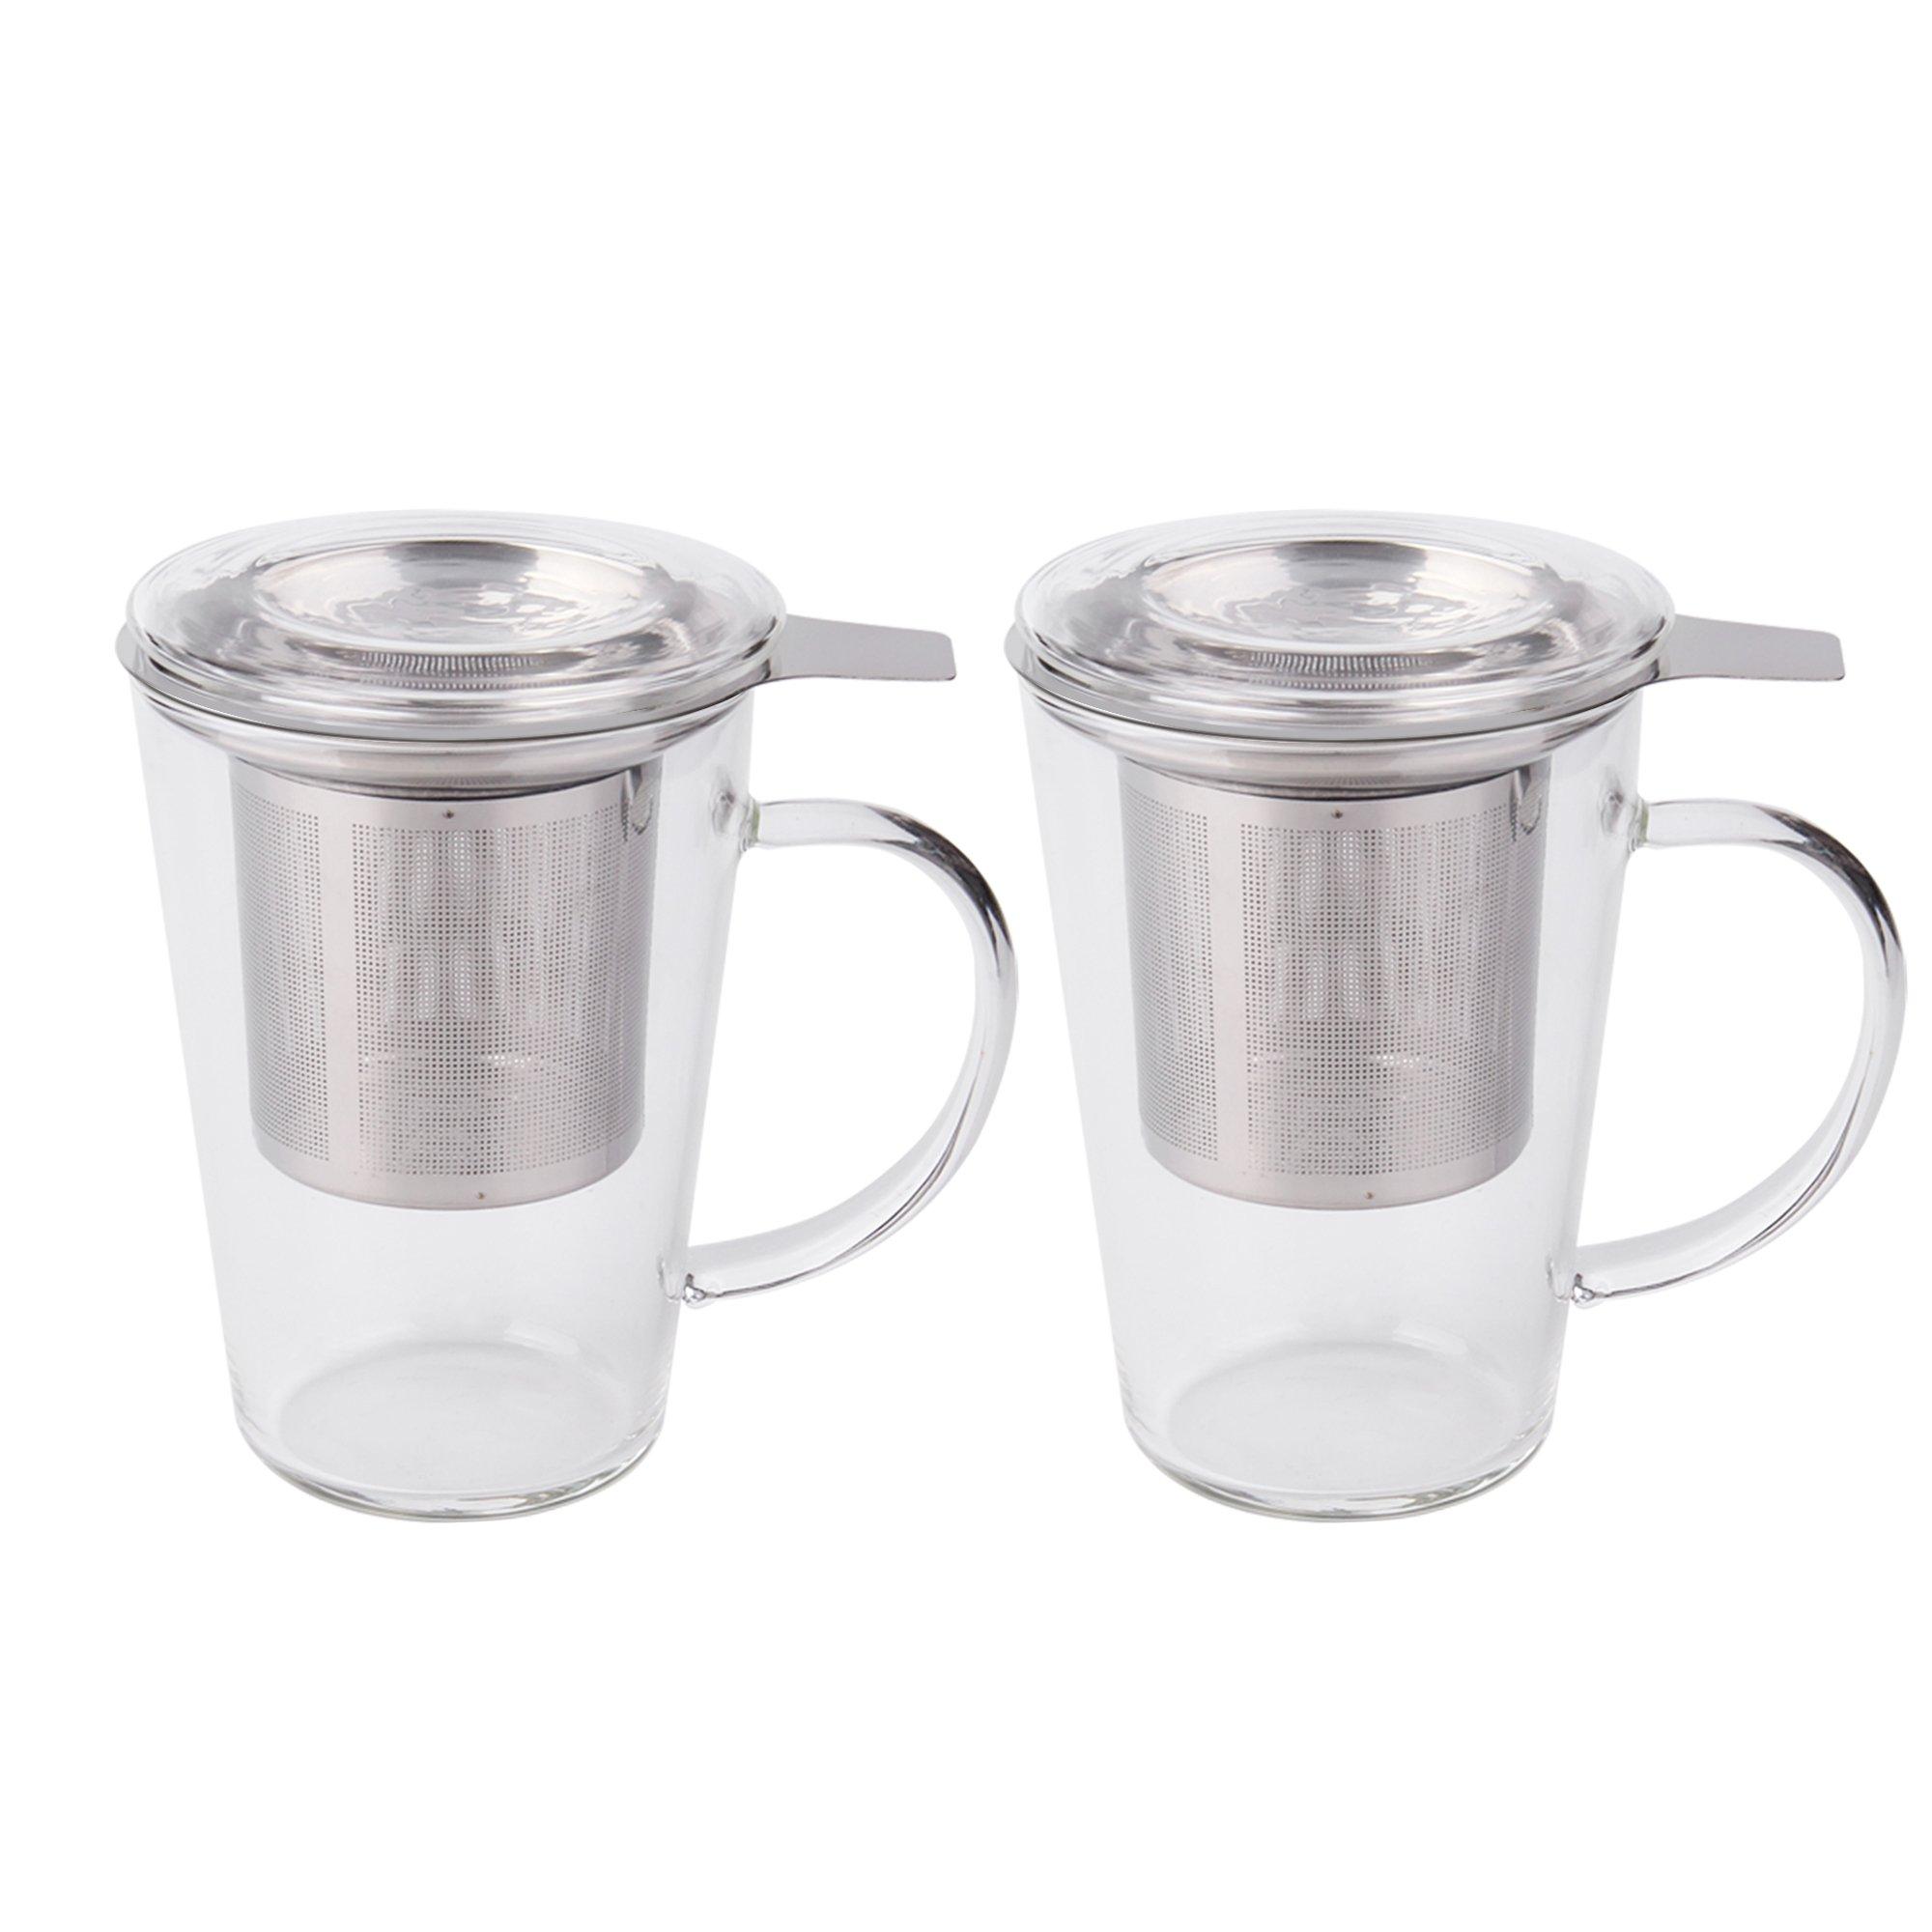 Fashion Simple Style Tea Mug with Infuser and Lid Glass Tea Cup 14 OZ (Glass set of 2)